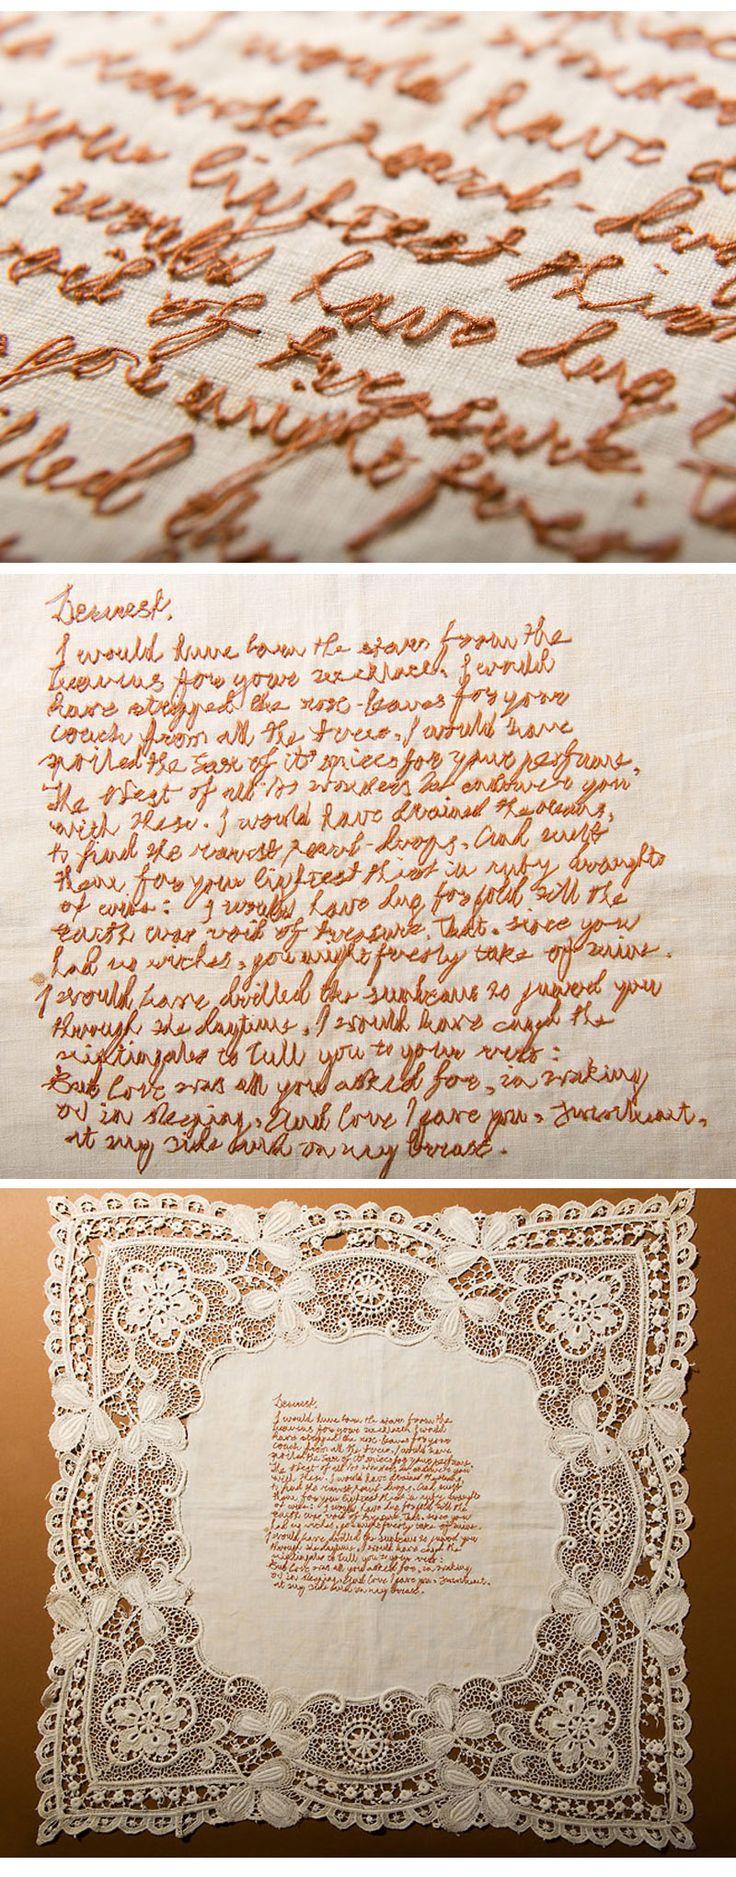 Stitch Love Letter   by Rosalind Wyatt